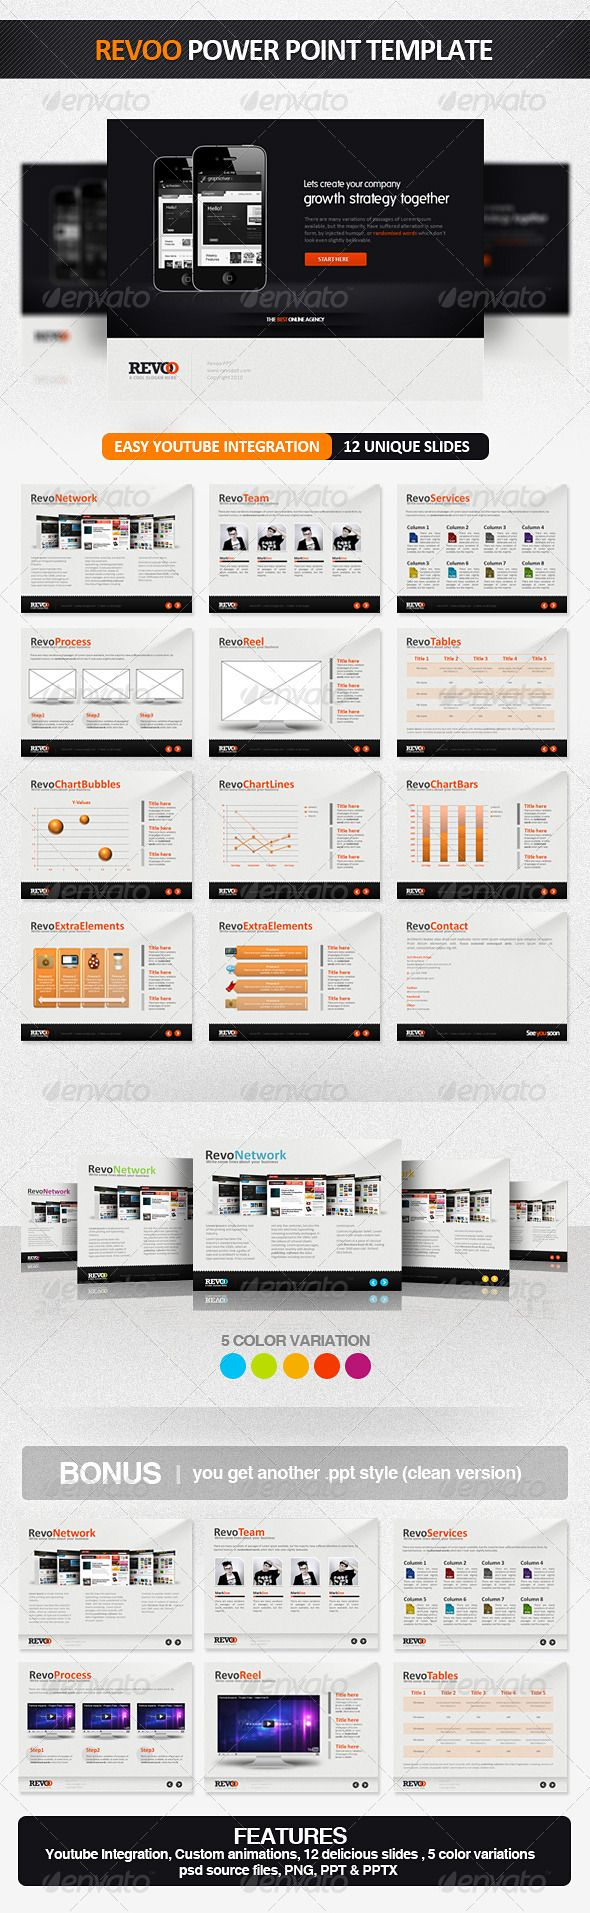 Presentation Templates - Revoo PowerPoint Presentation Template | GraphicRiver